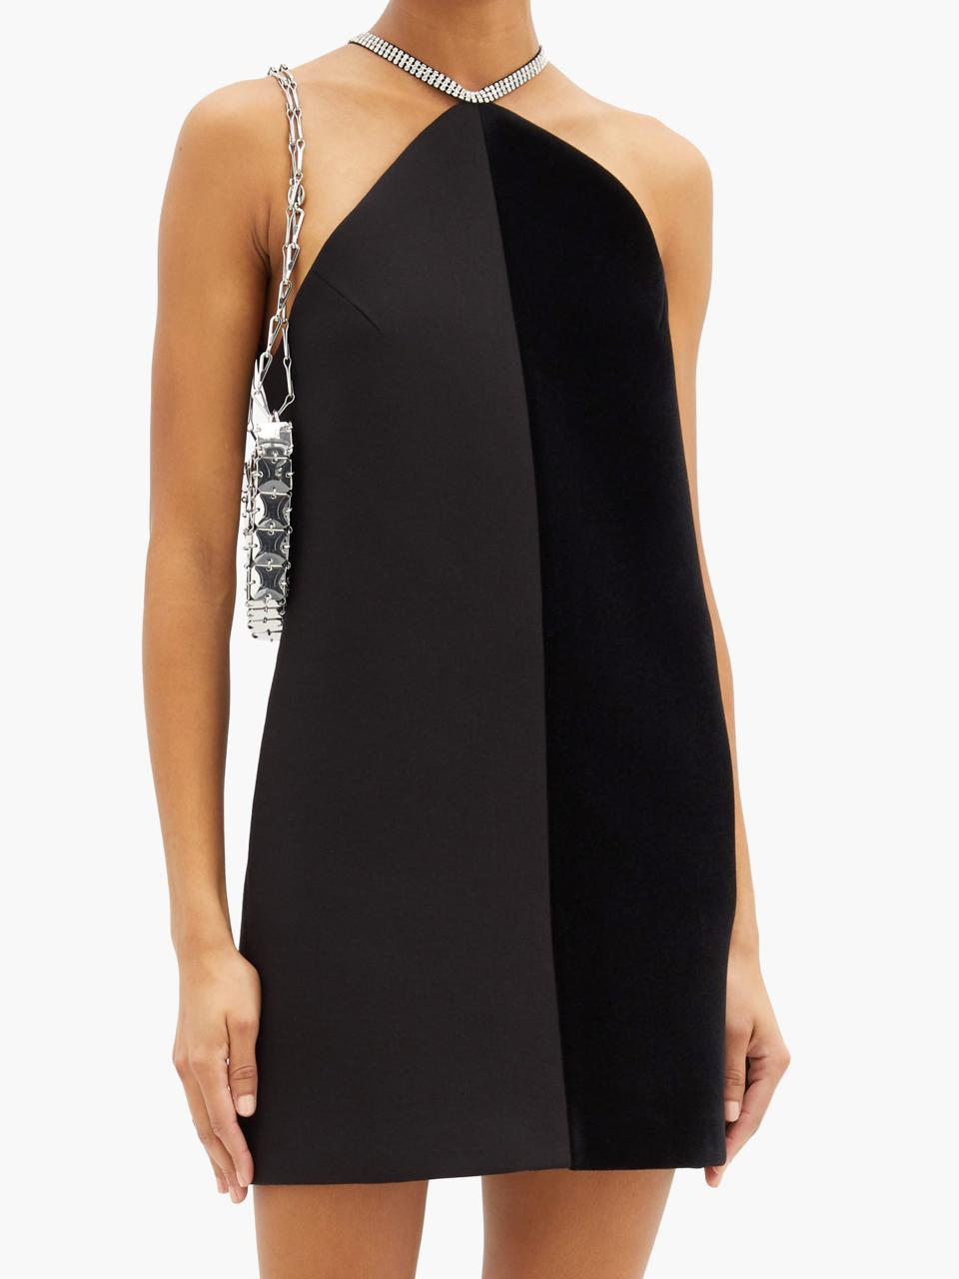 Crystal-Embellished Velvet and Crepe Mini Dress by David Koma